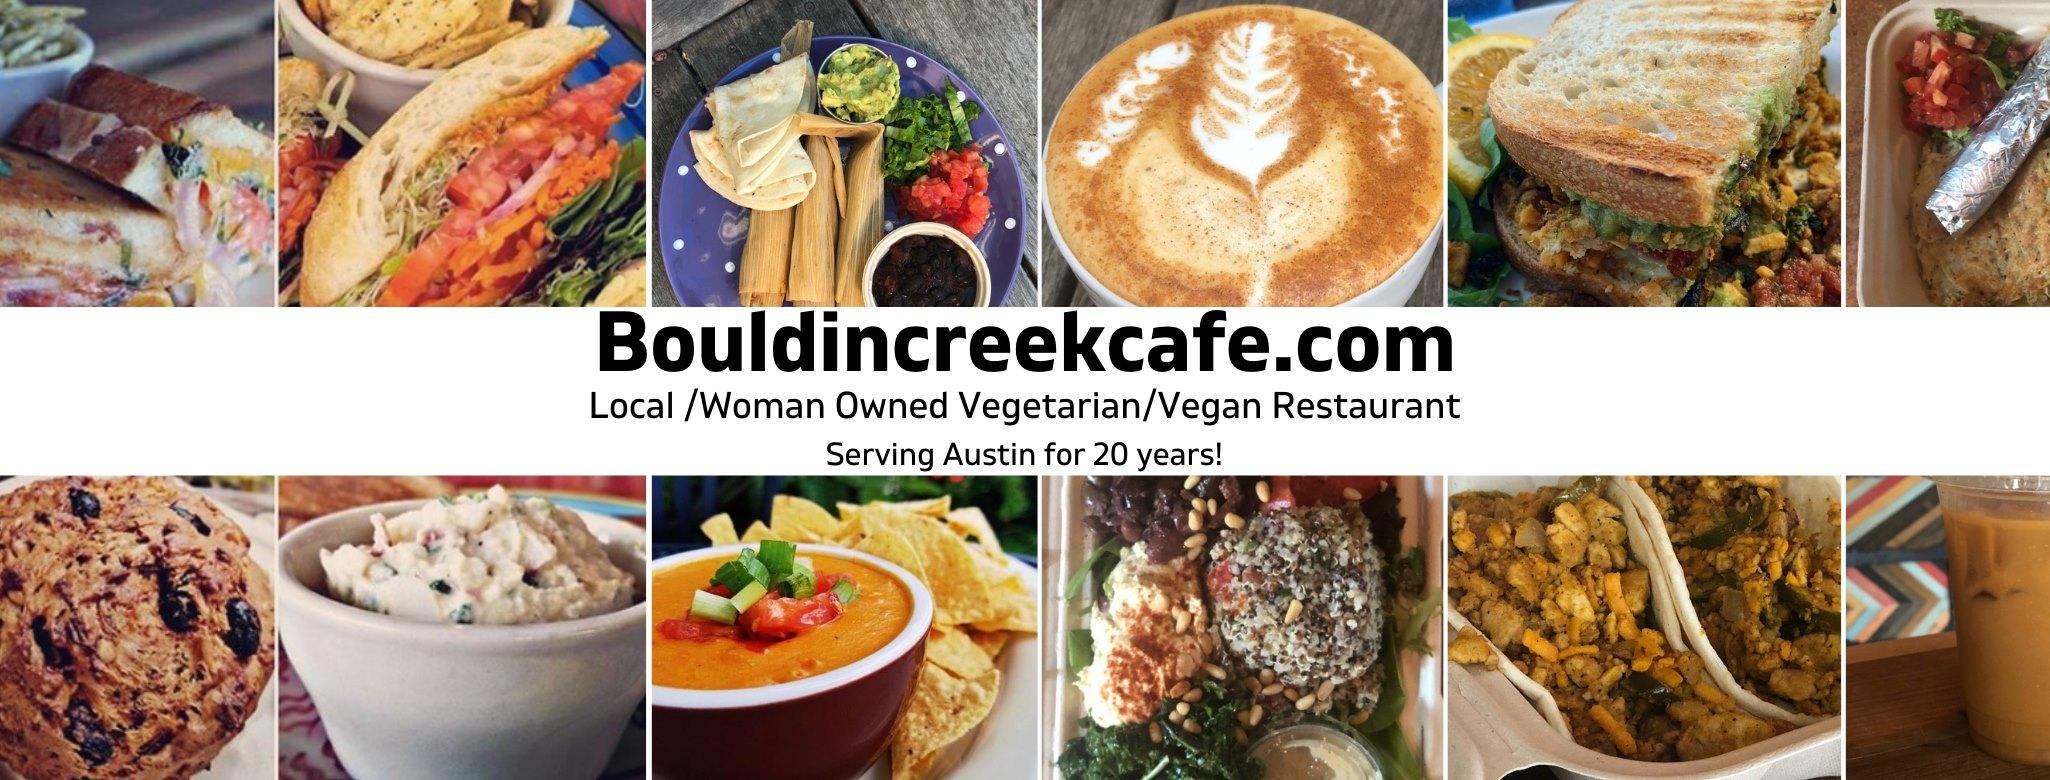 Best Vegan Restaurants in Austin